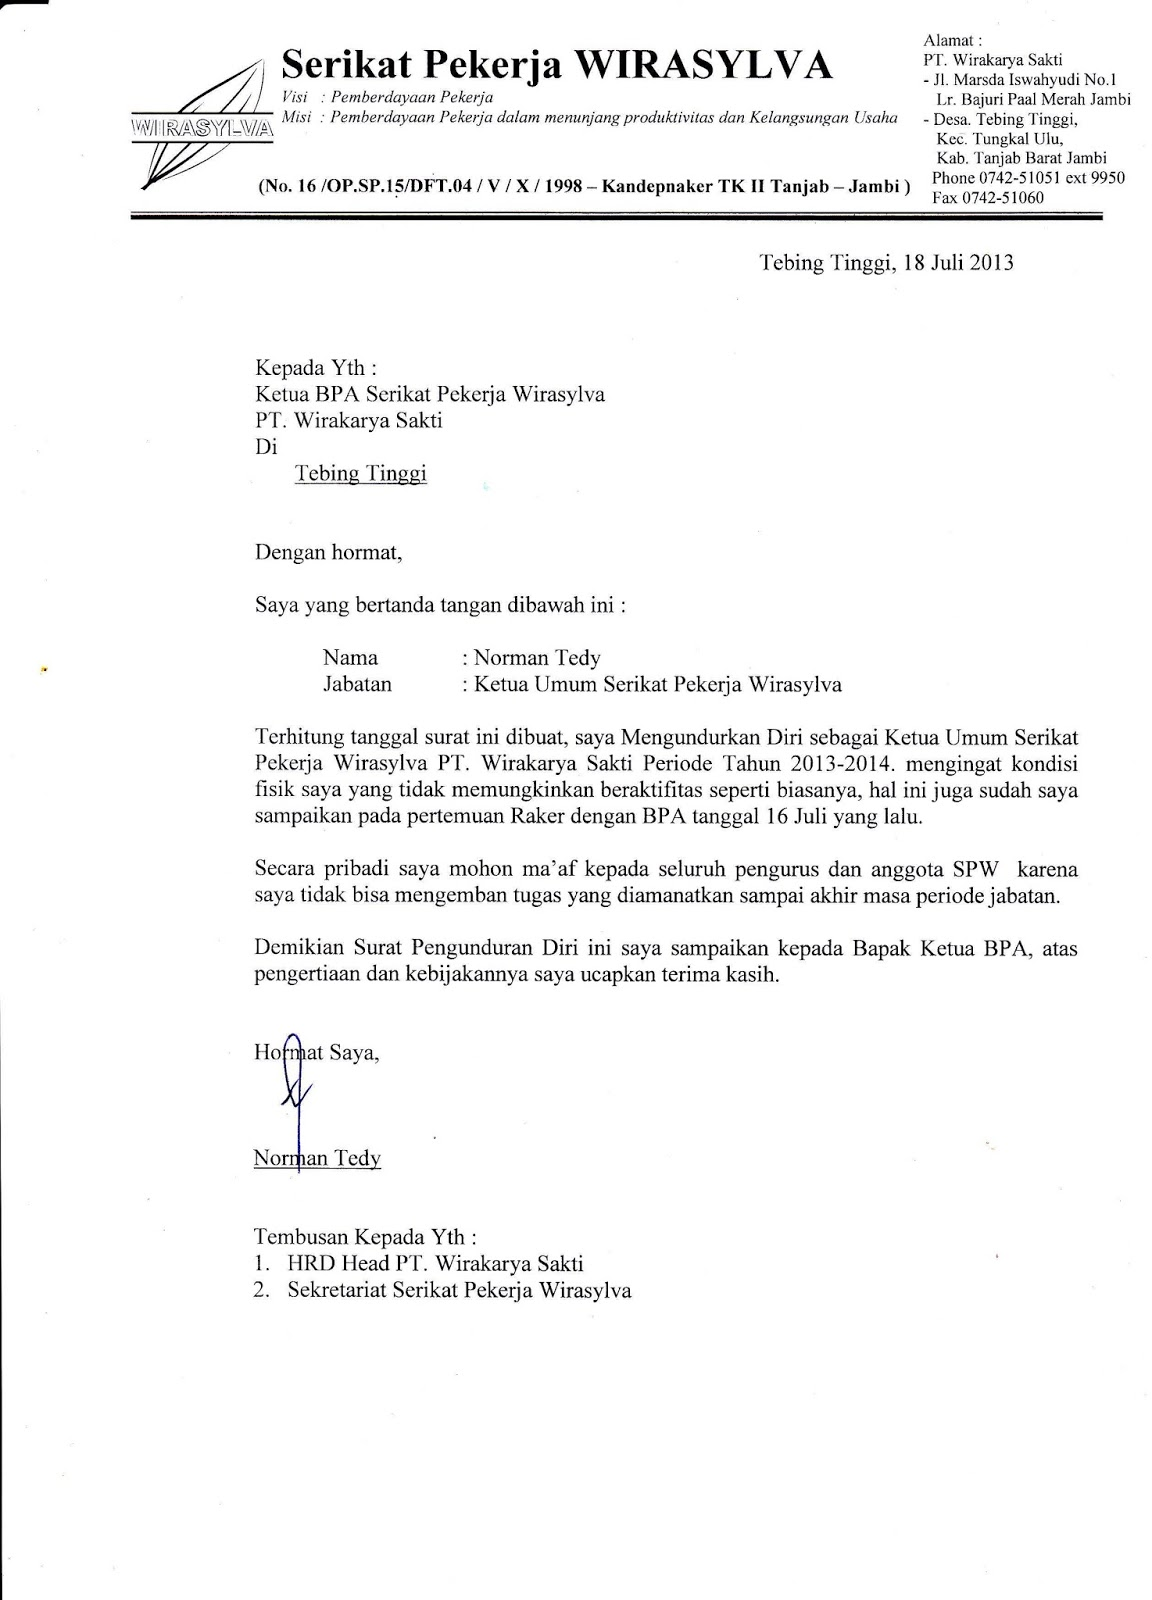 Contoh Surat Balasan Pengunduran Diri Dari Organisasi ...